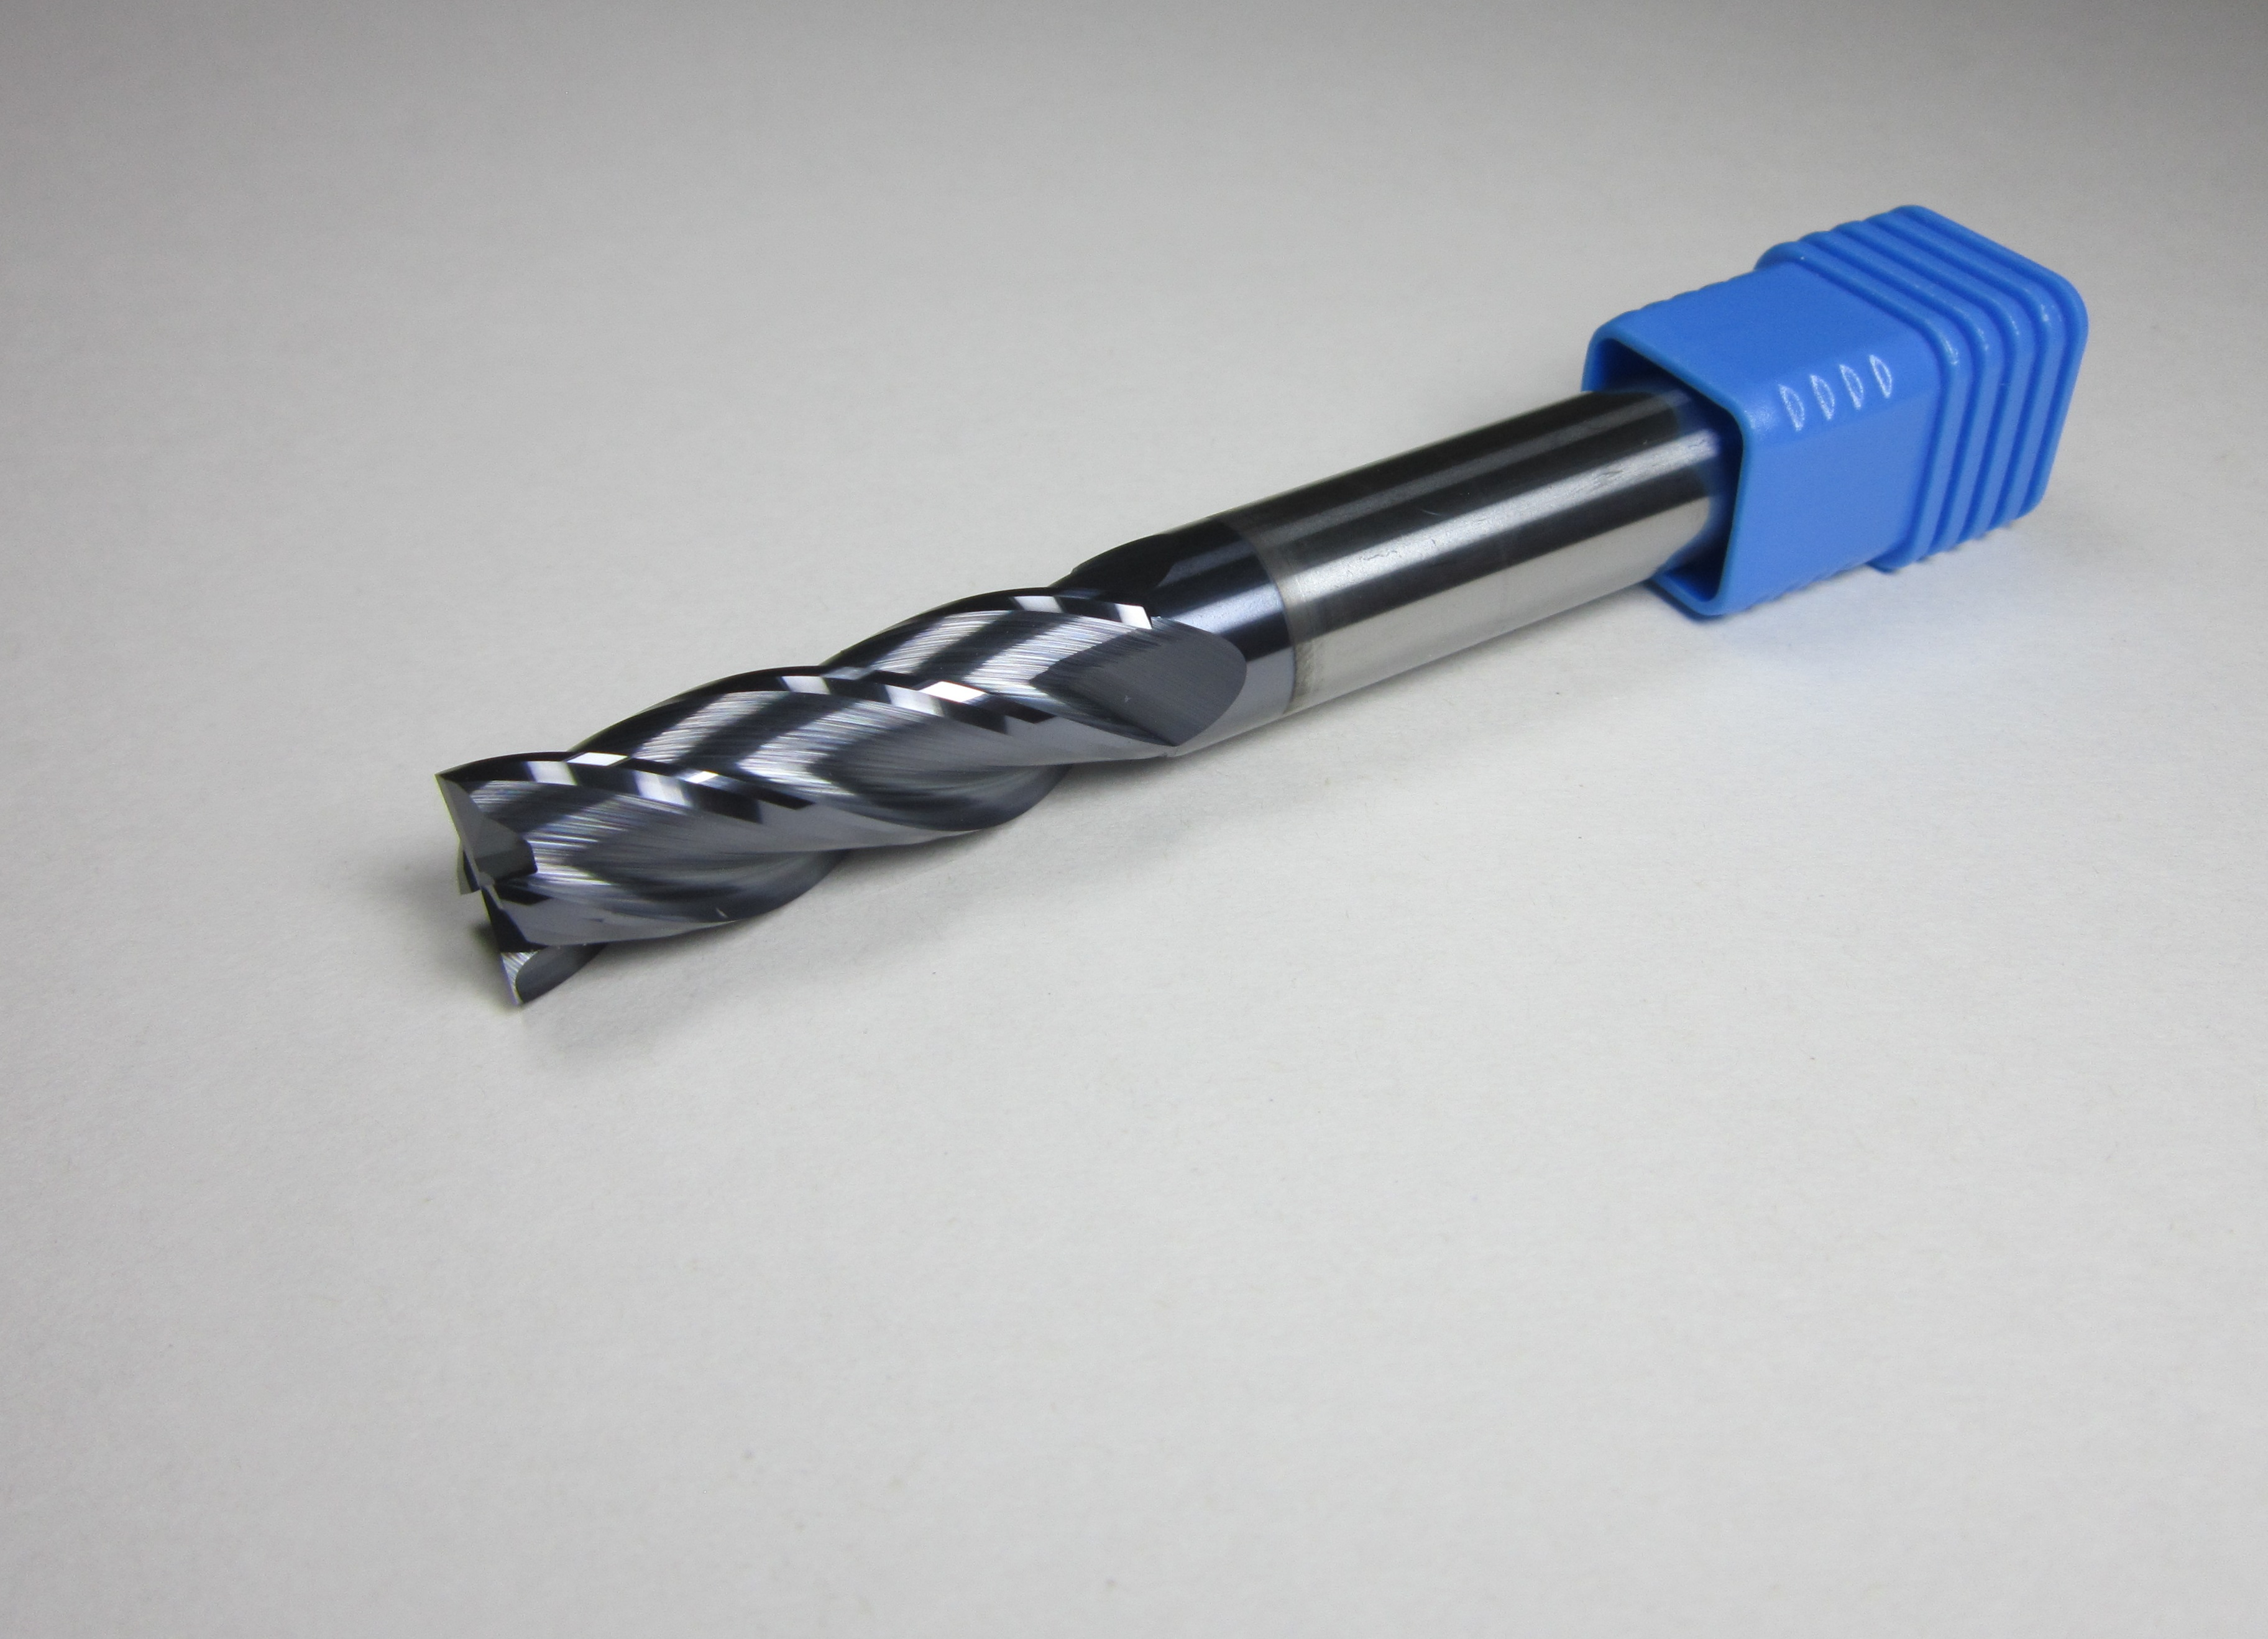 1Pc 3mm 4 Flutes 100MM Long Shank Tungsten Carbide End-Mills CNC Tool